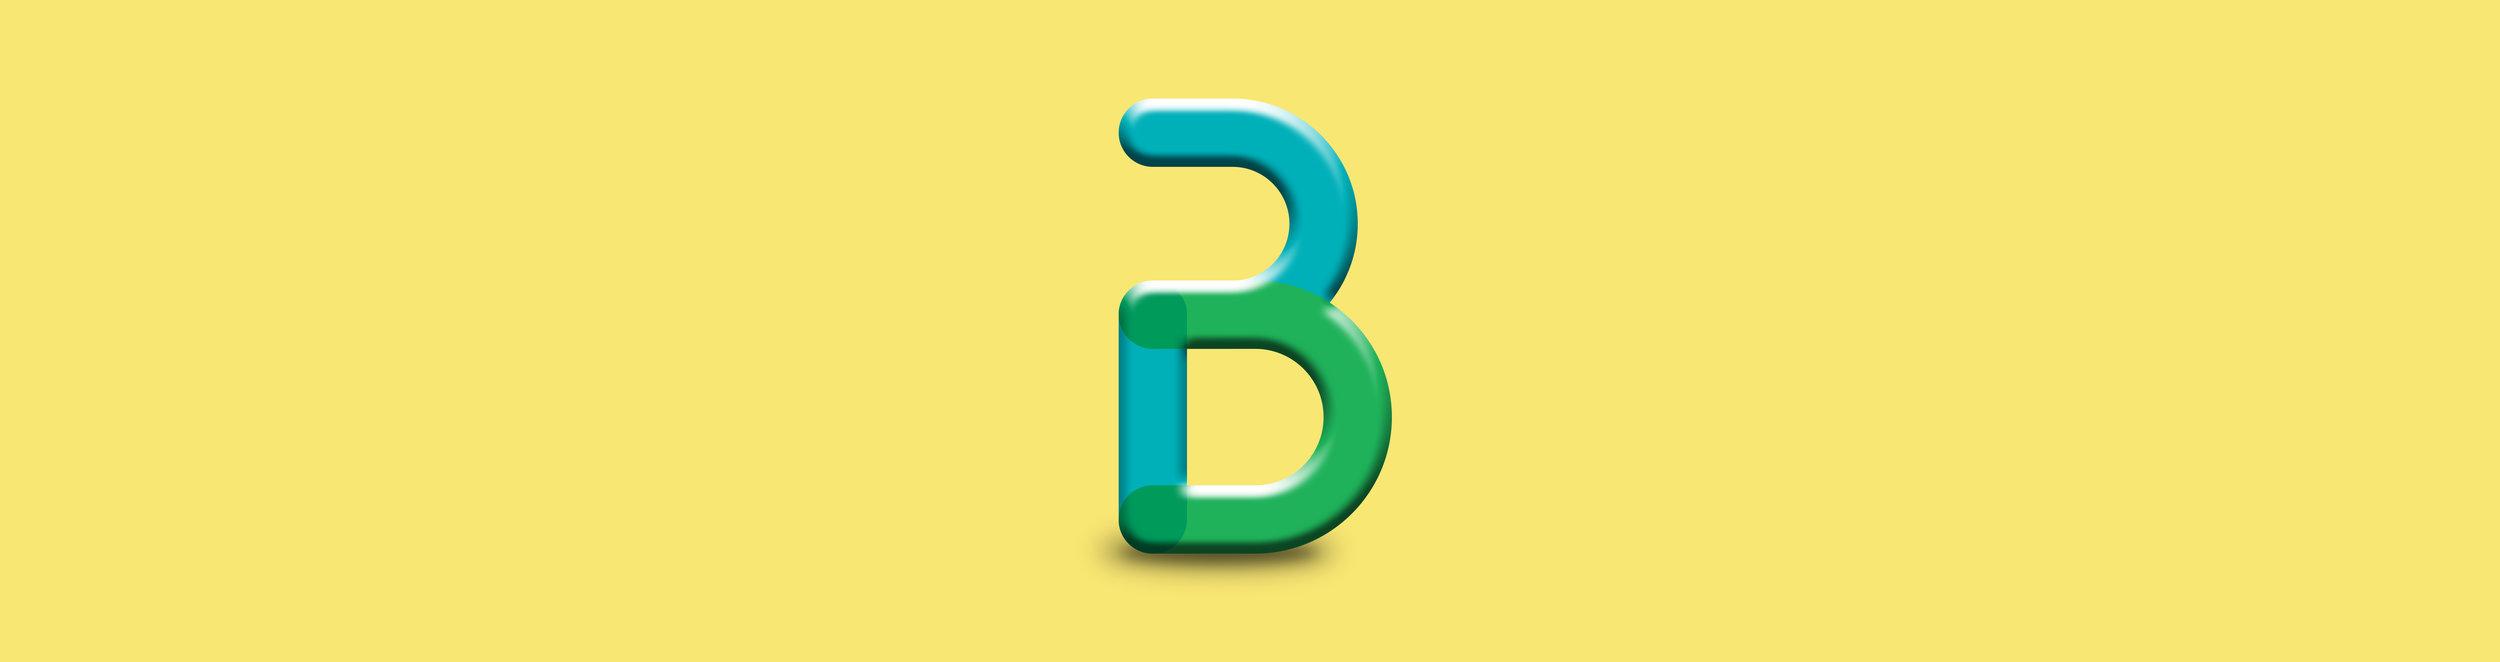 Biopolix - Naming and Branding strategy